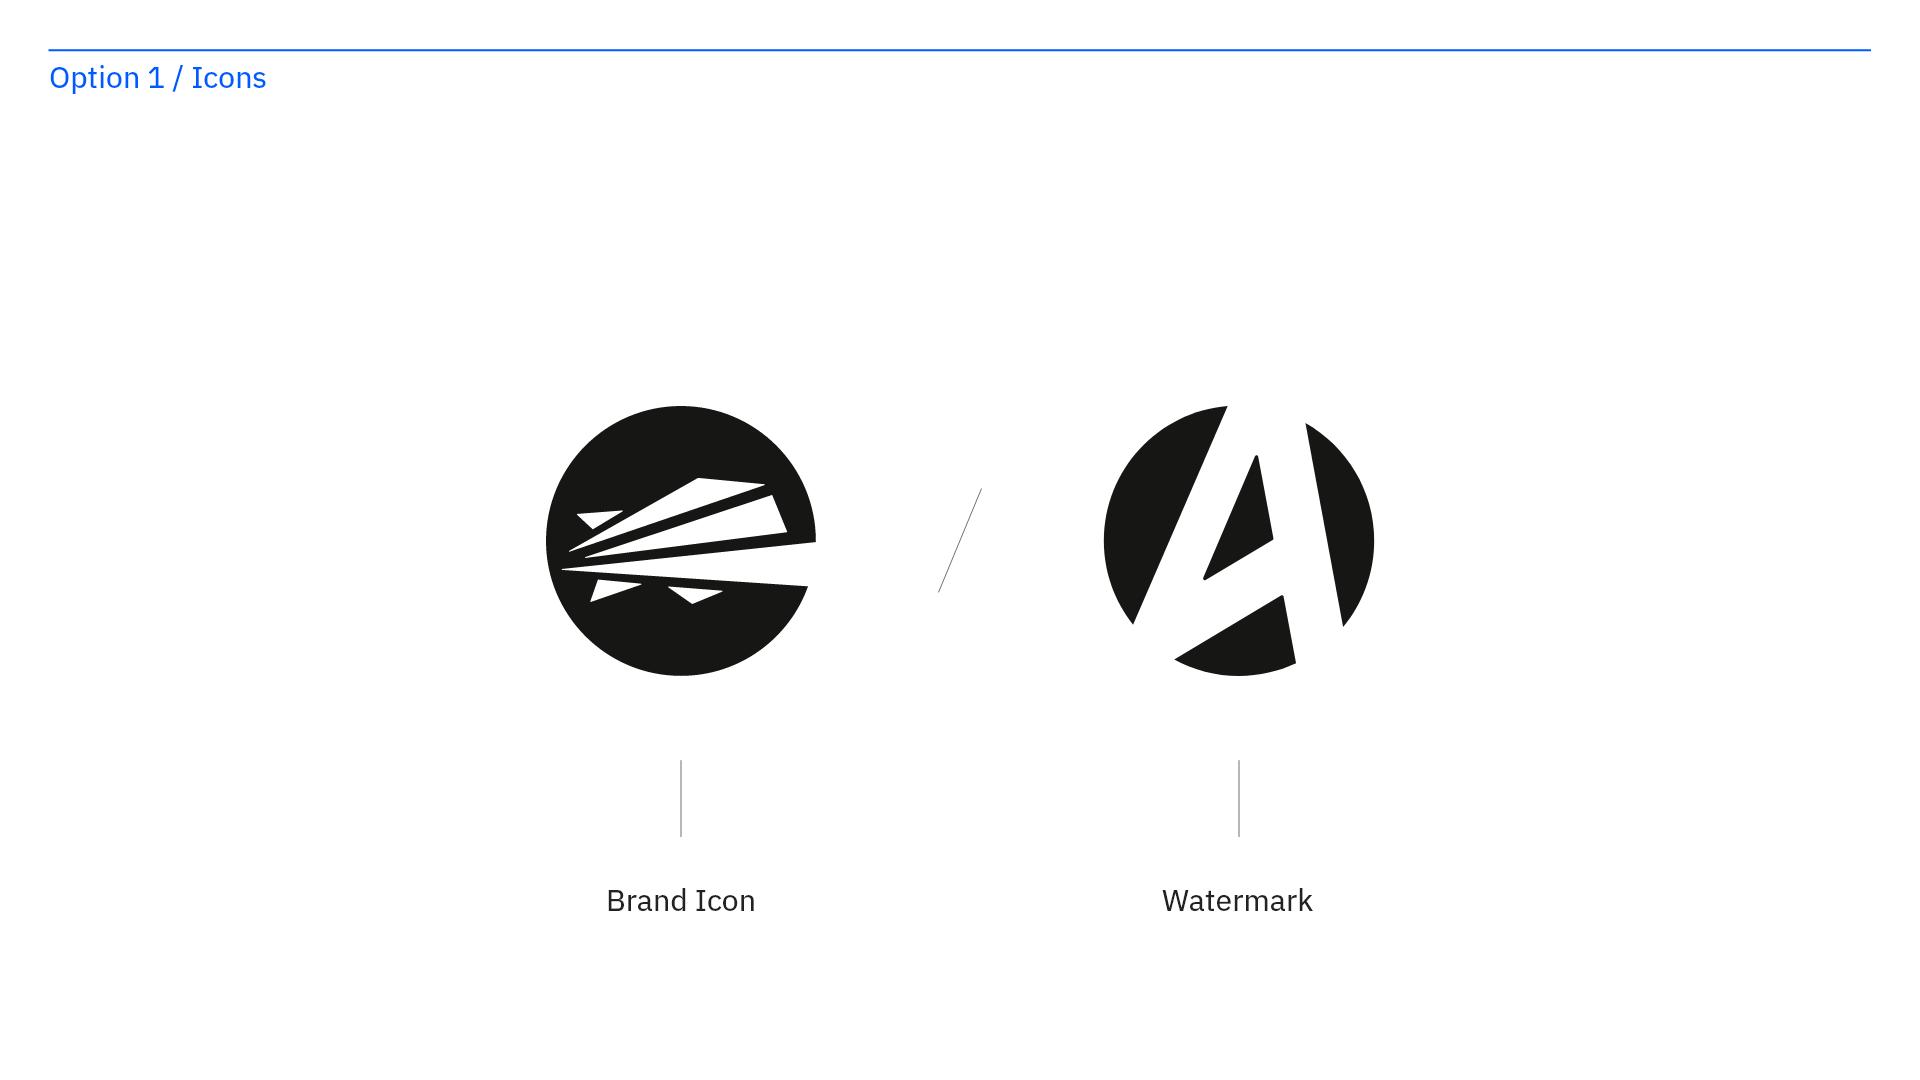 Airship Images | Design & Branding 1